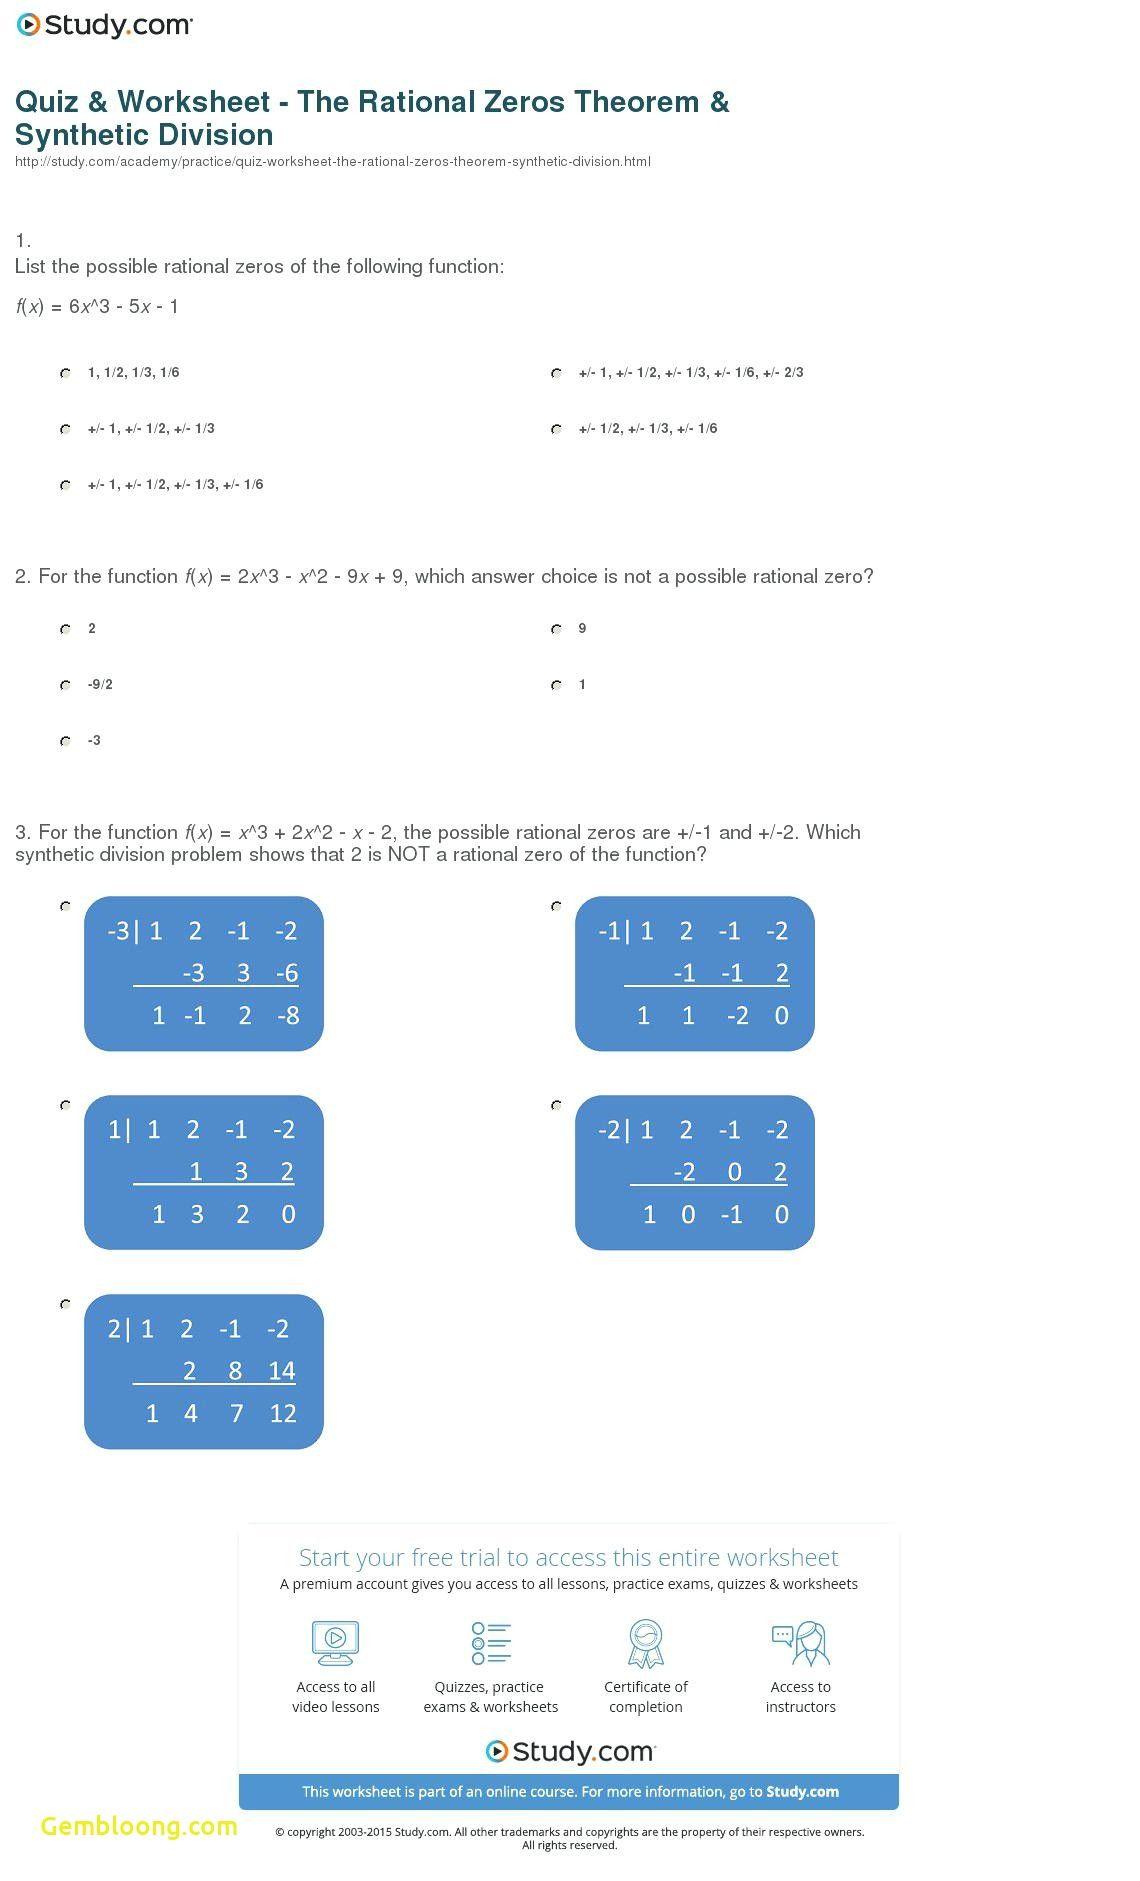 Readable Addition Of Polynomials Worksheet Worksheet Printable In 2020 Kindergarten Subtraction Worksheets Polynomials Worksheets